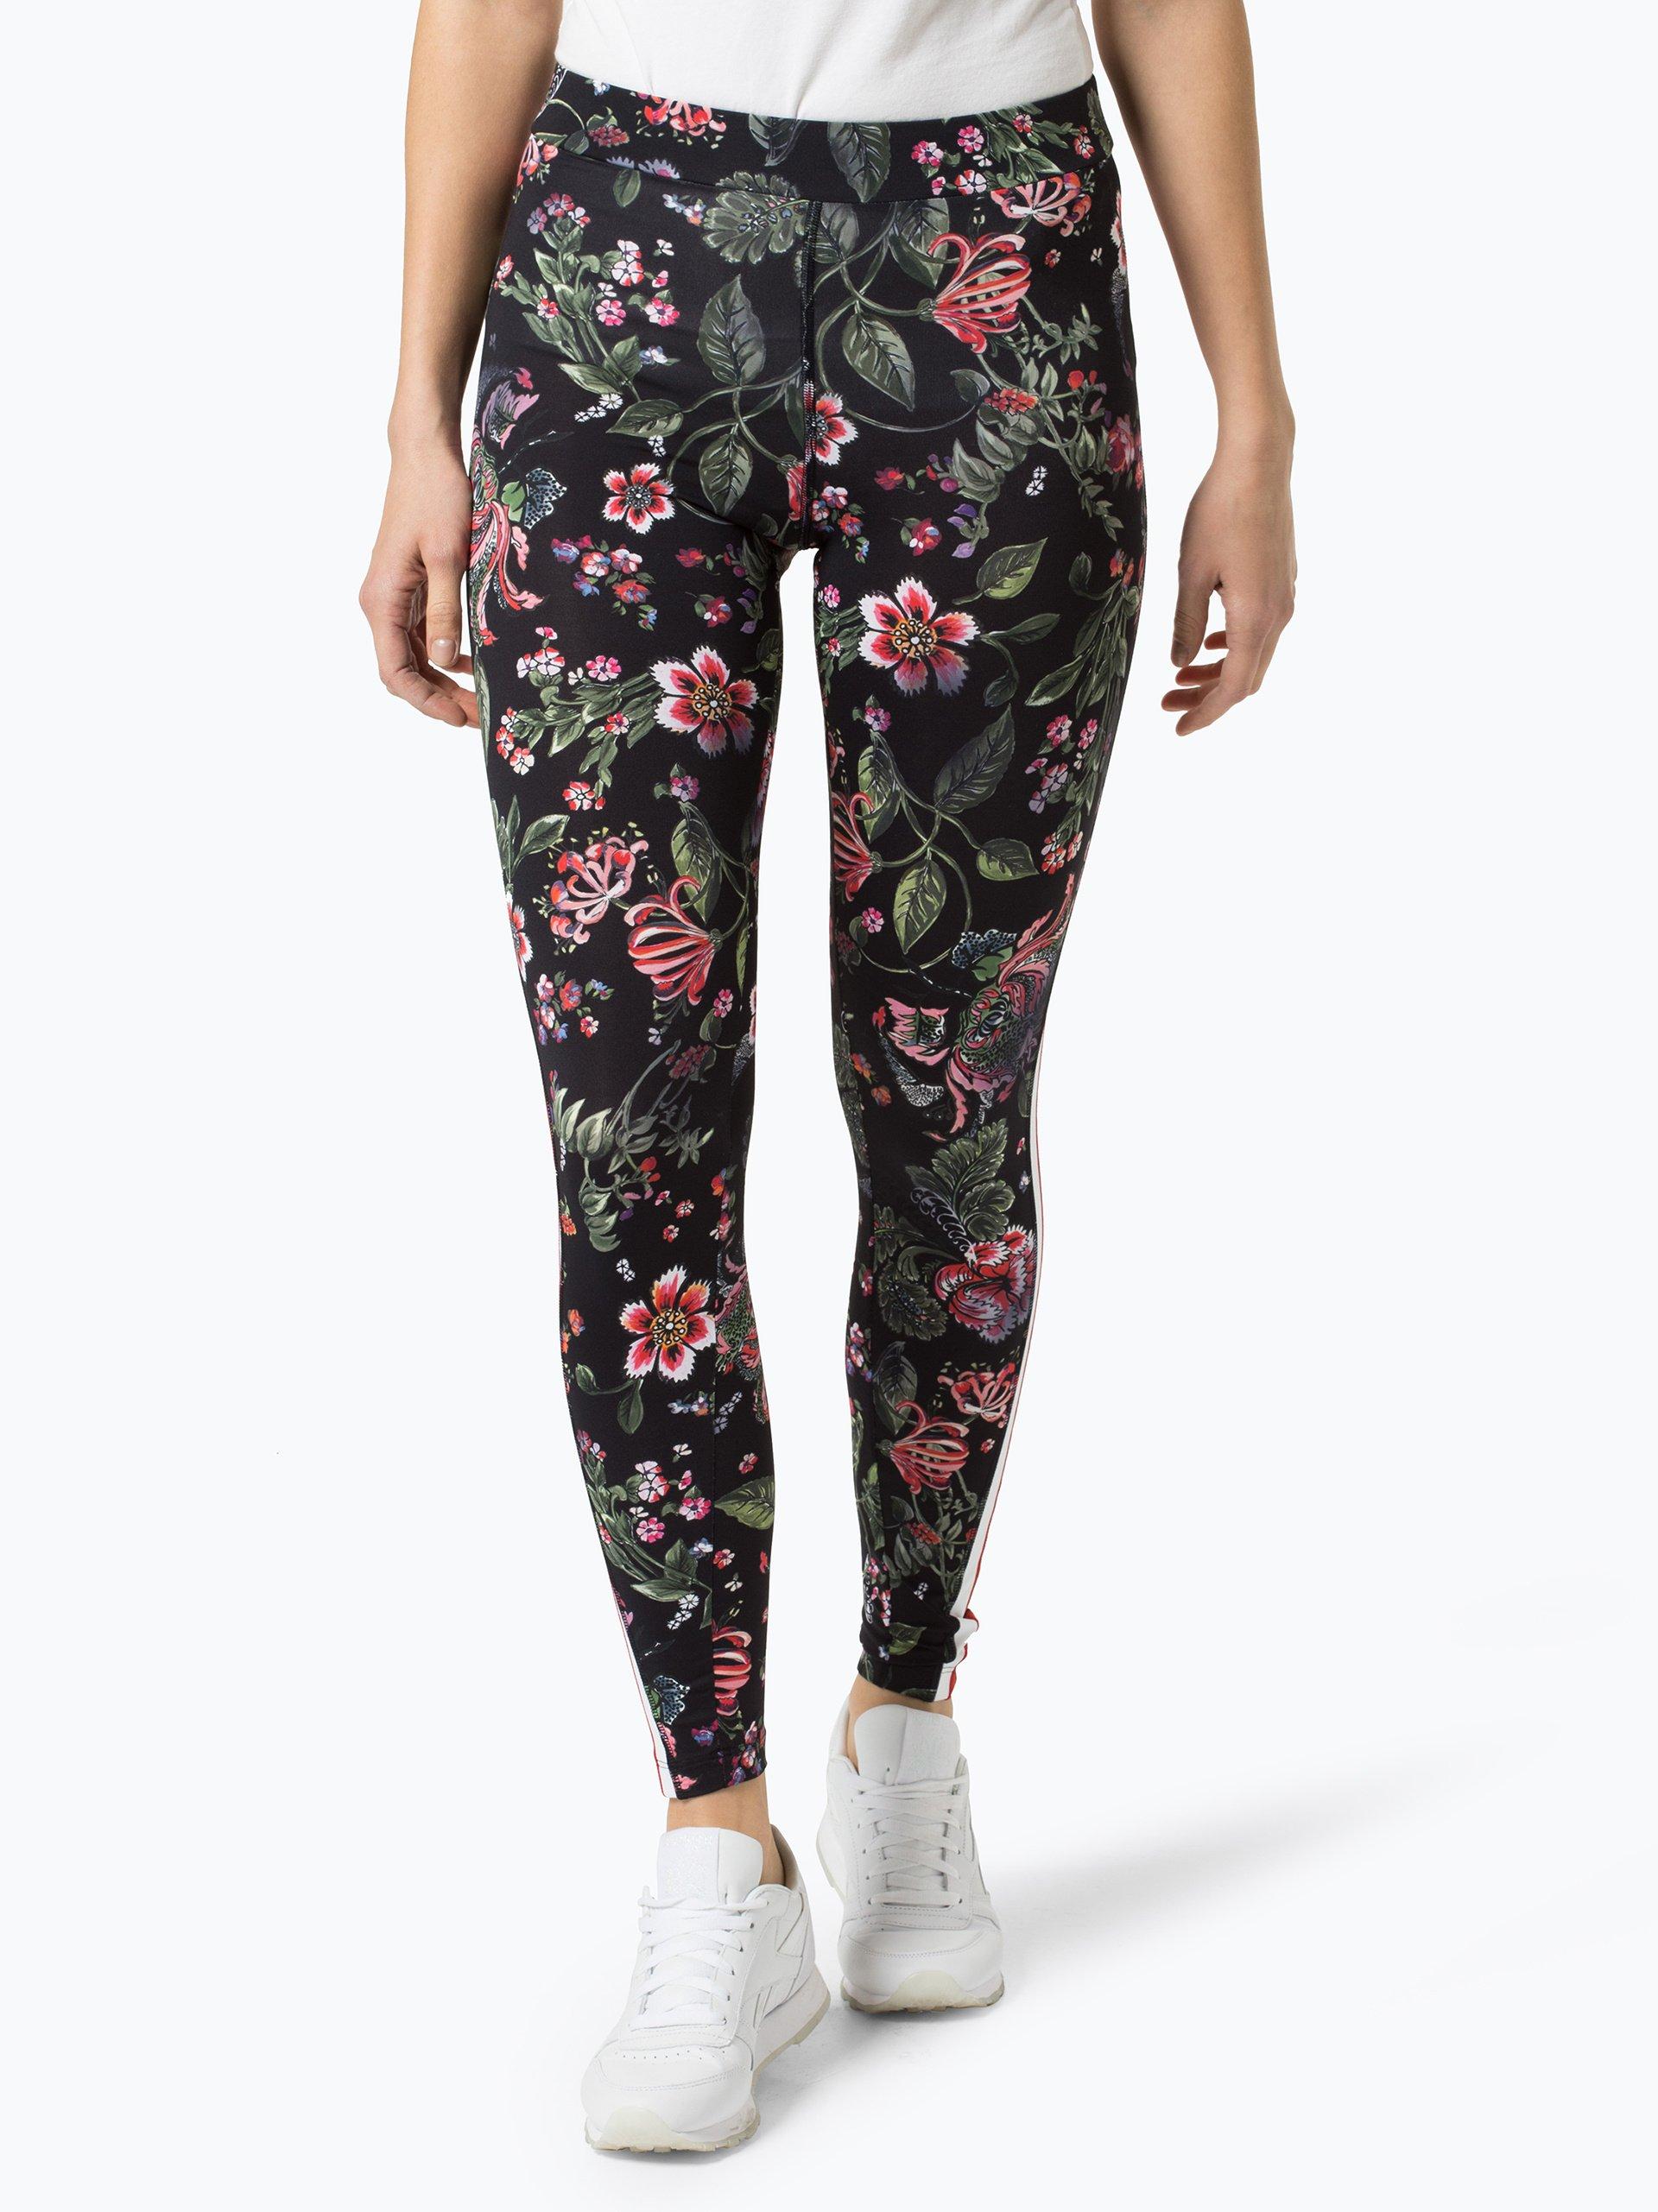 marc cain sports damen leggings 2 online kaufen peek und cloppenburg de. Black Bedroom Furniture Sets. Home Design Ideas